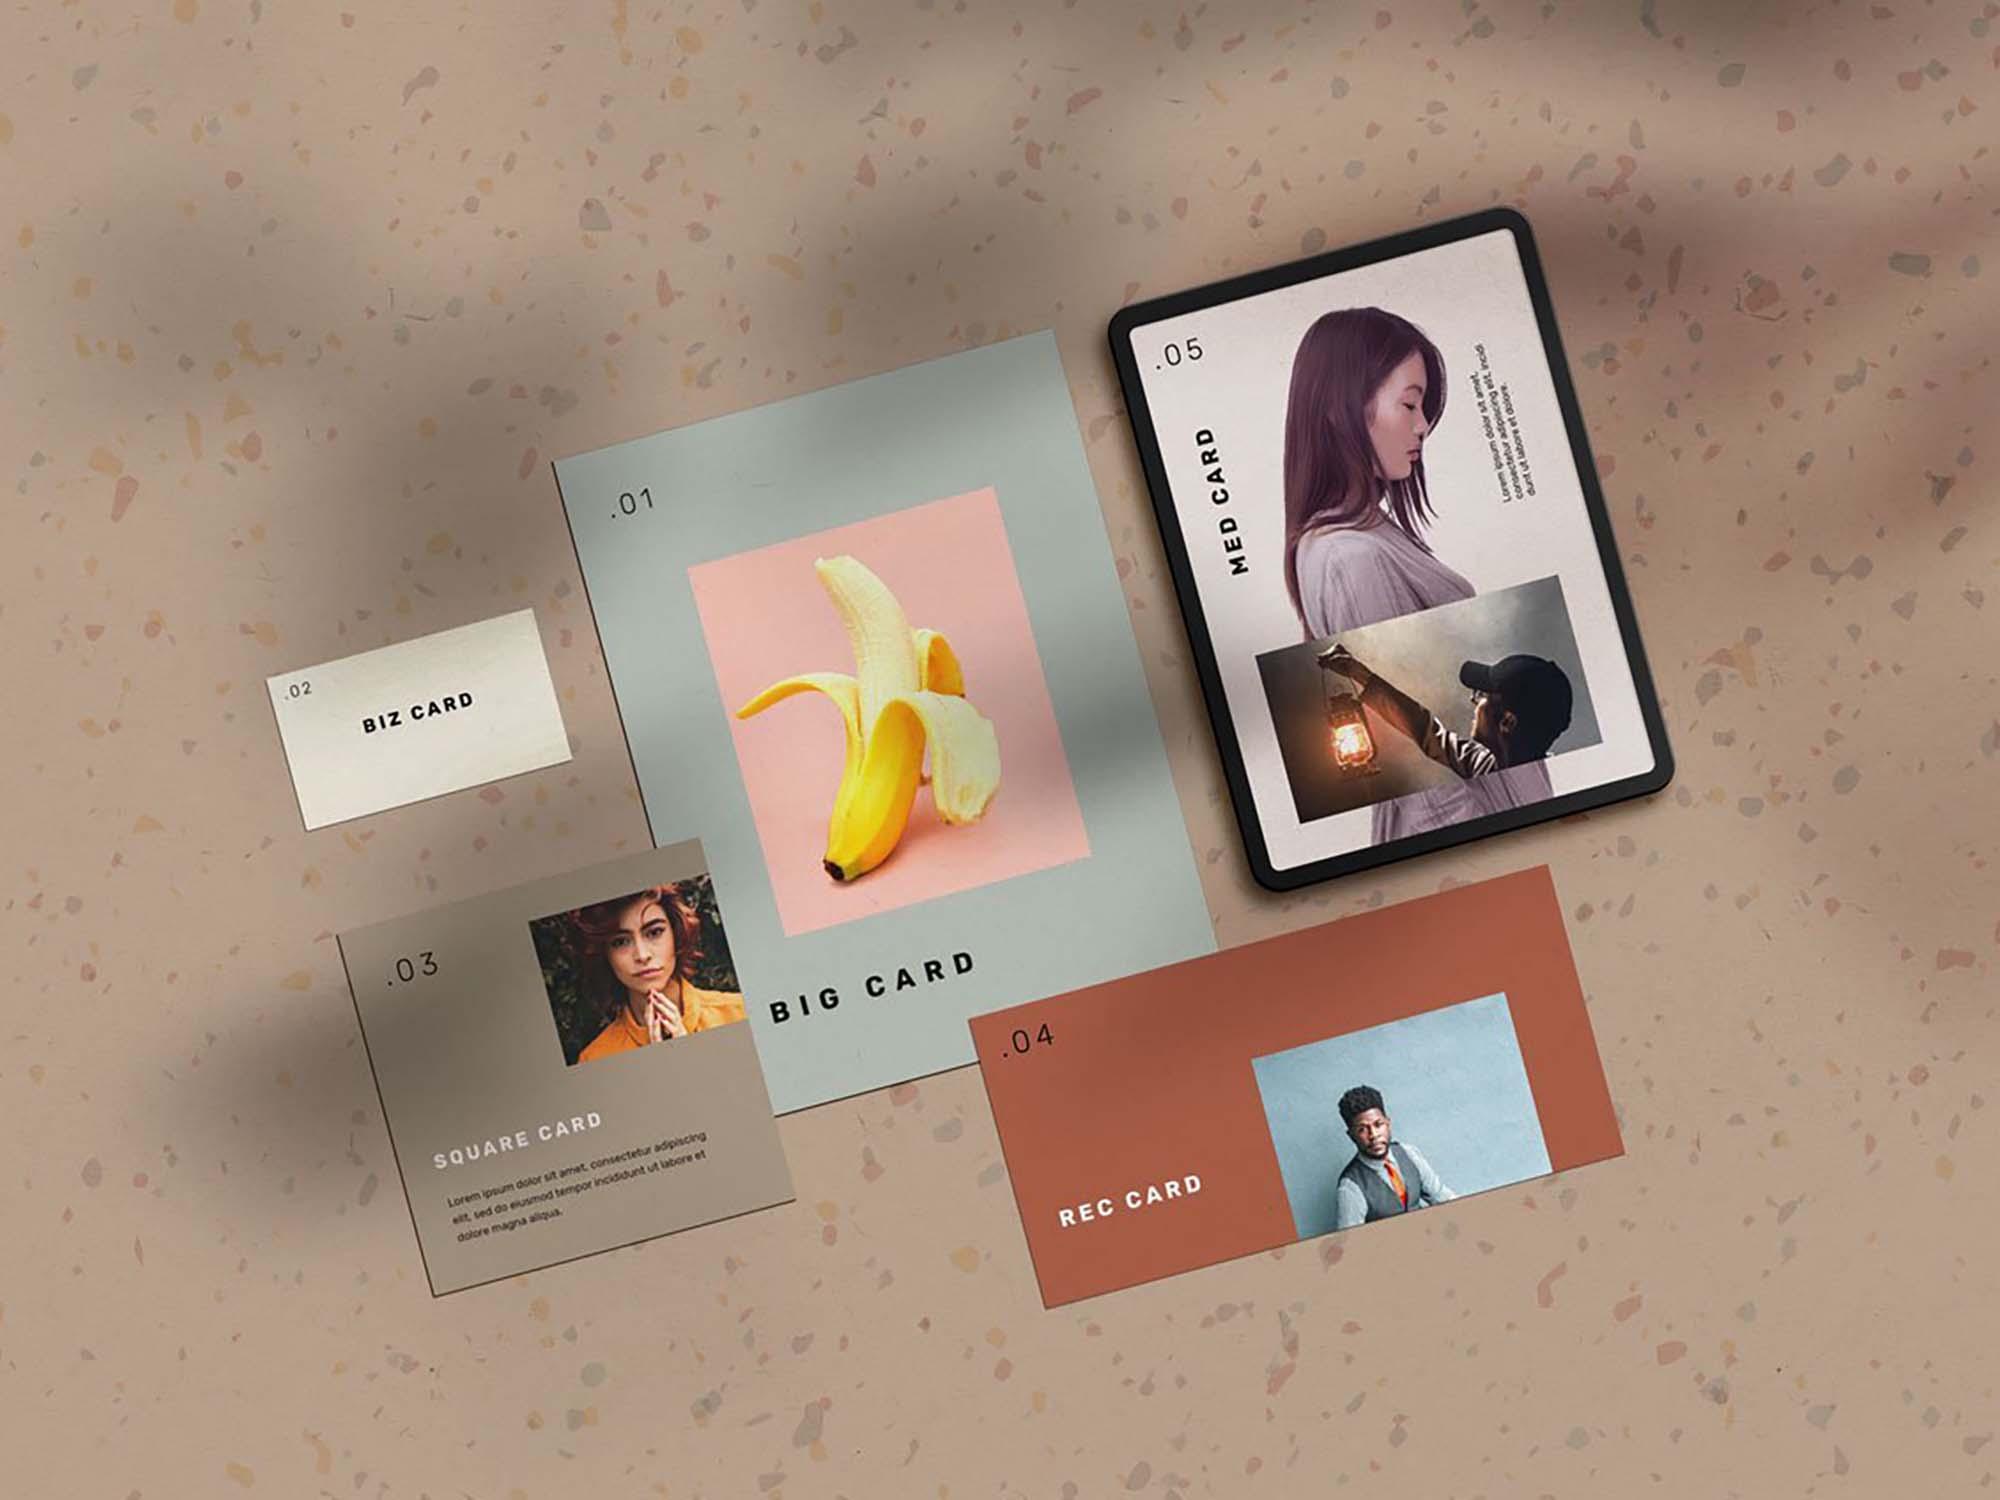 Stationery Cards Mockup 2